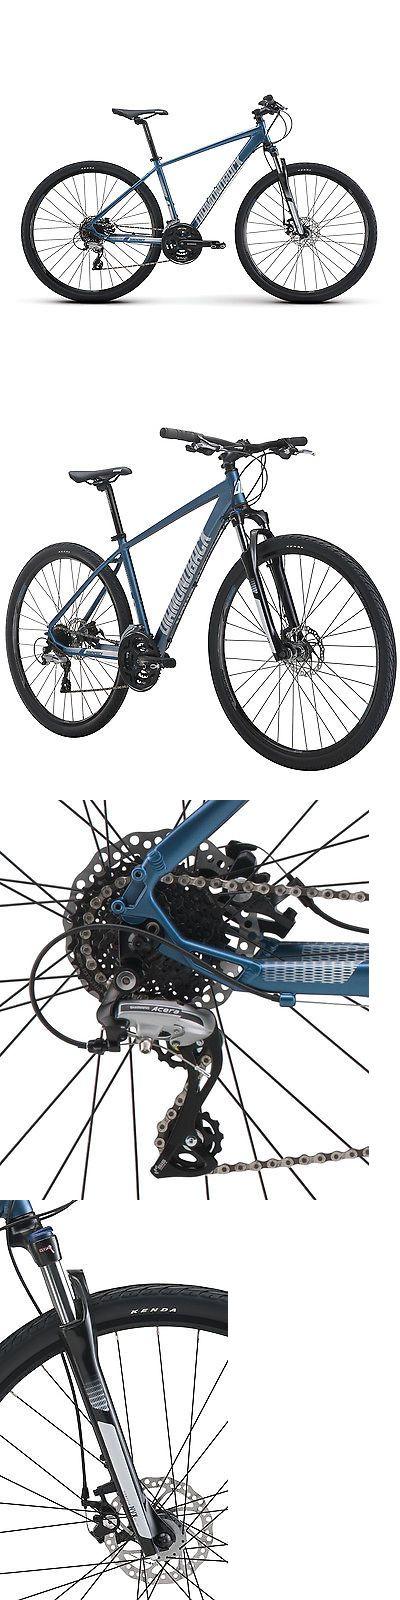 sporting goods: Diamondback 2017 Trace Sport Mountain Bike Blue -> BUY IT NOW ONLY: $384.99 on eBay!